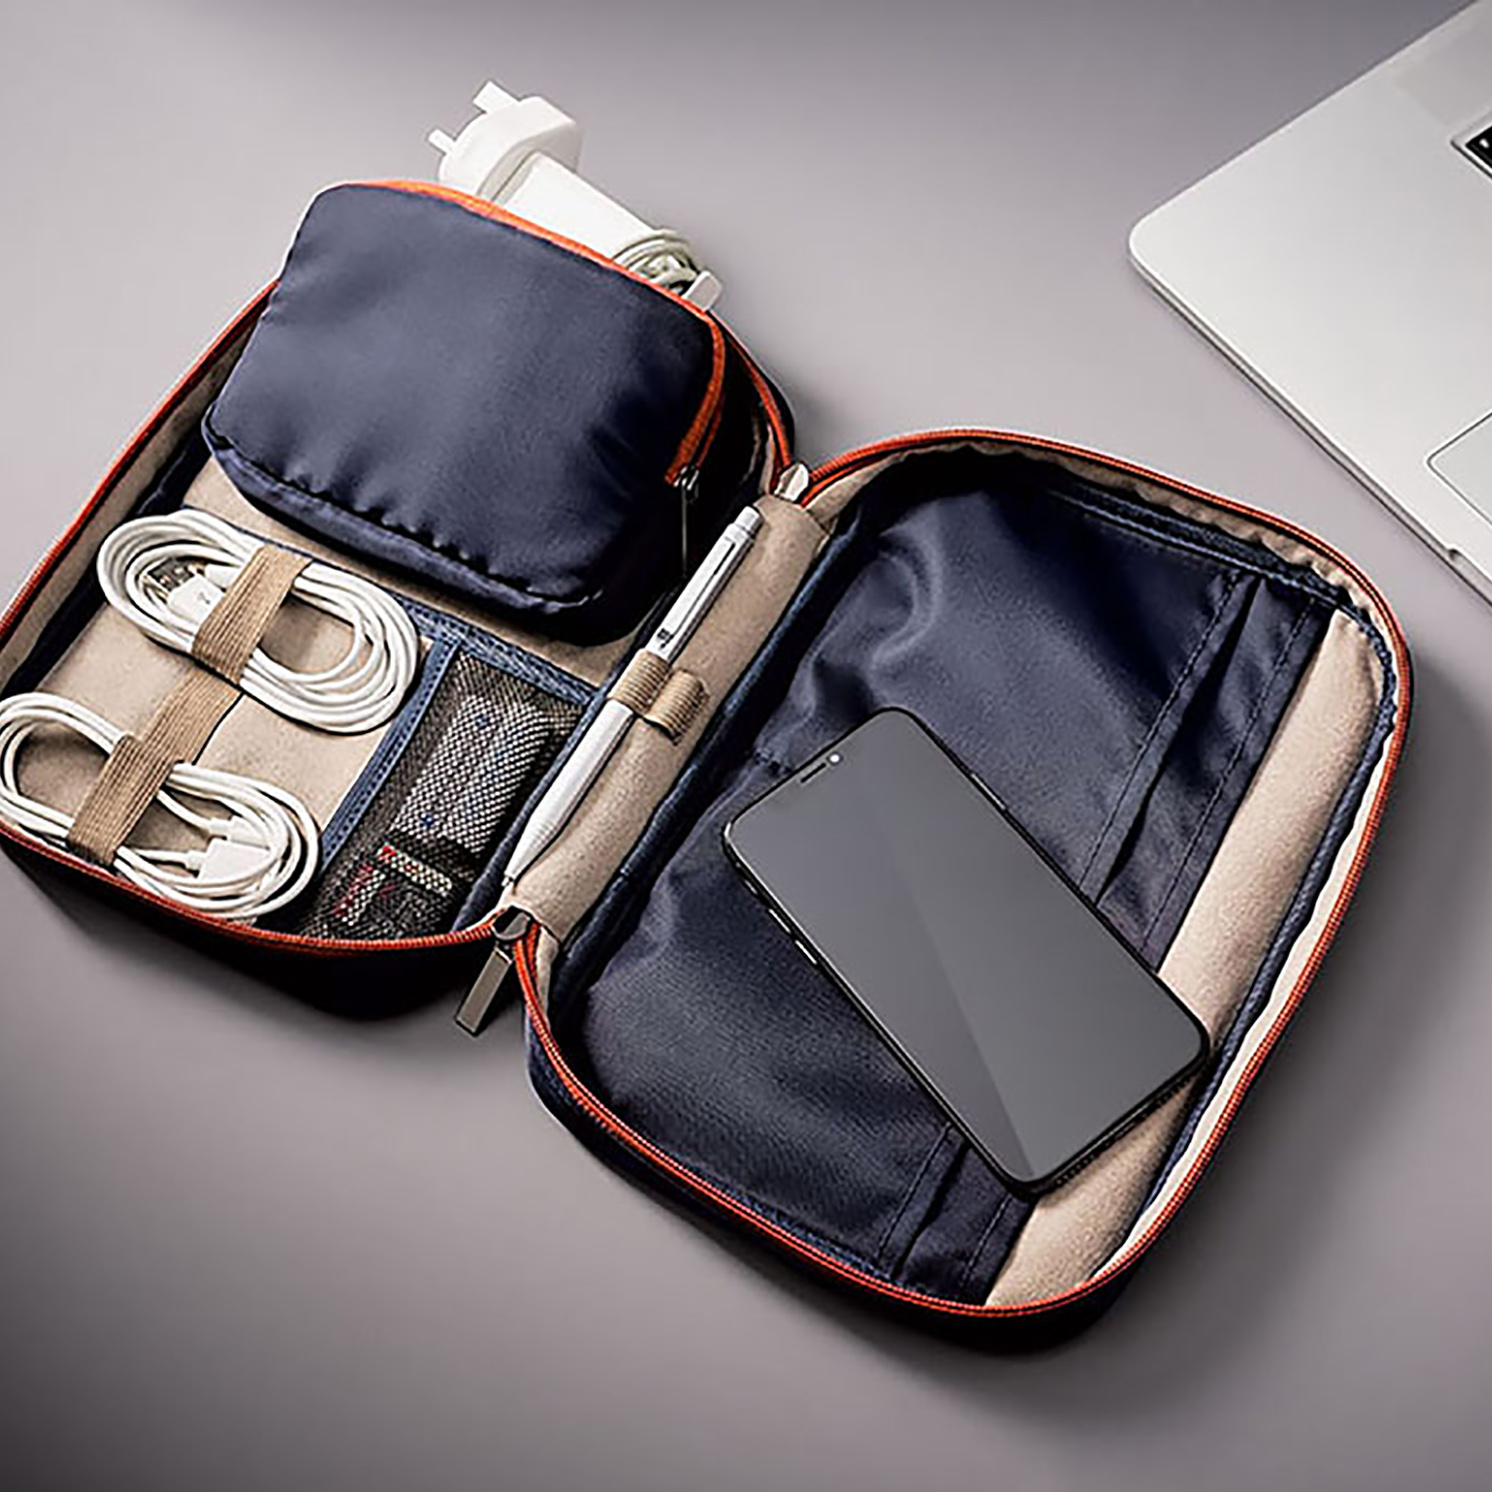 Gentlemen's Hardware – Blue Travel Tech Case